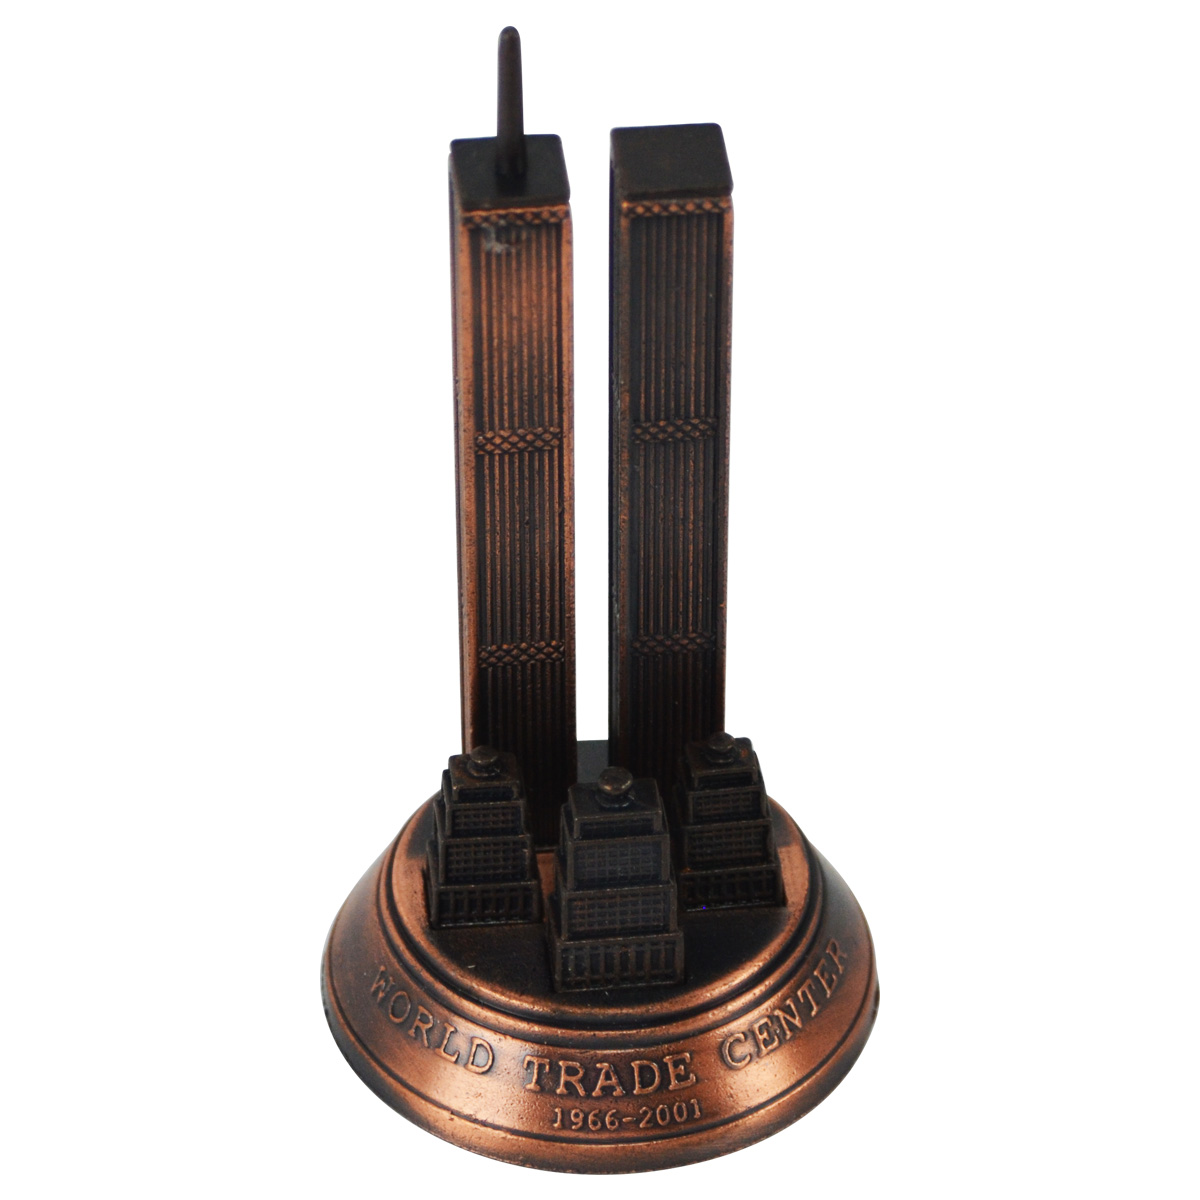 Bronze Metal Liberty Bell Miniature Replica Die Cast Novelty Pencil Sharpener